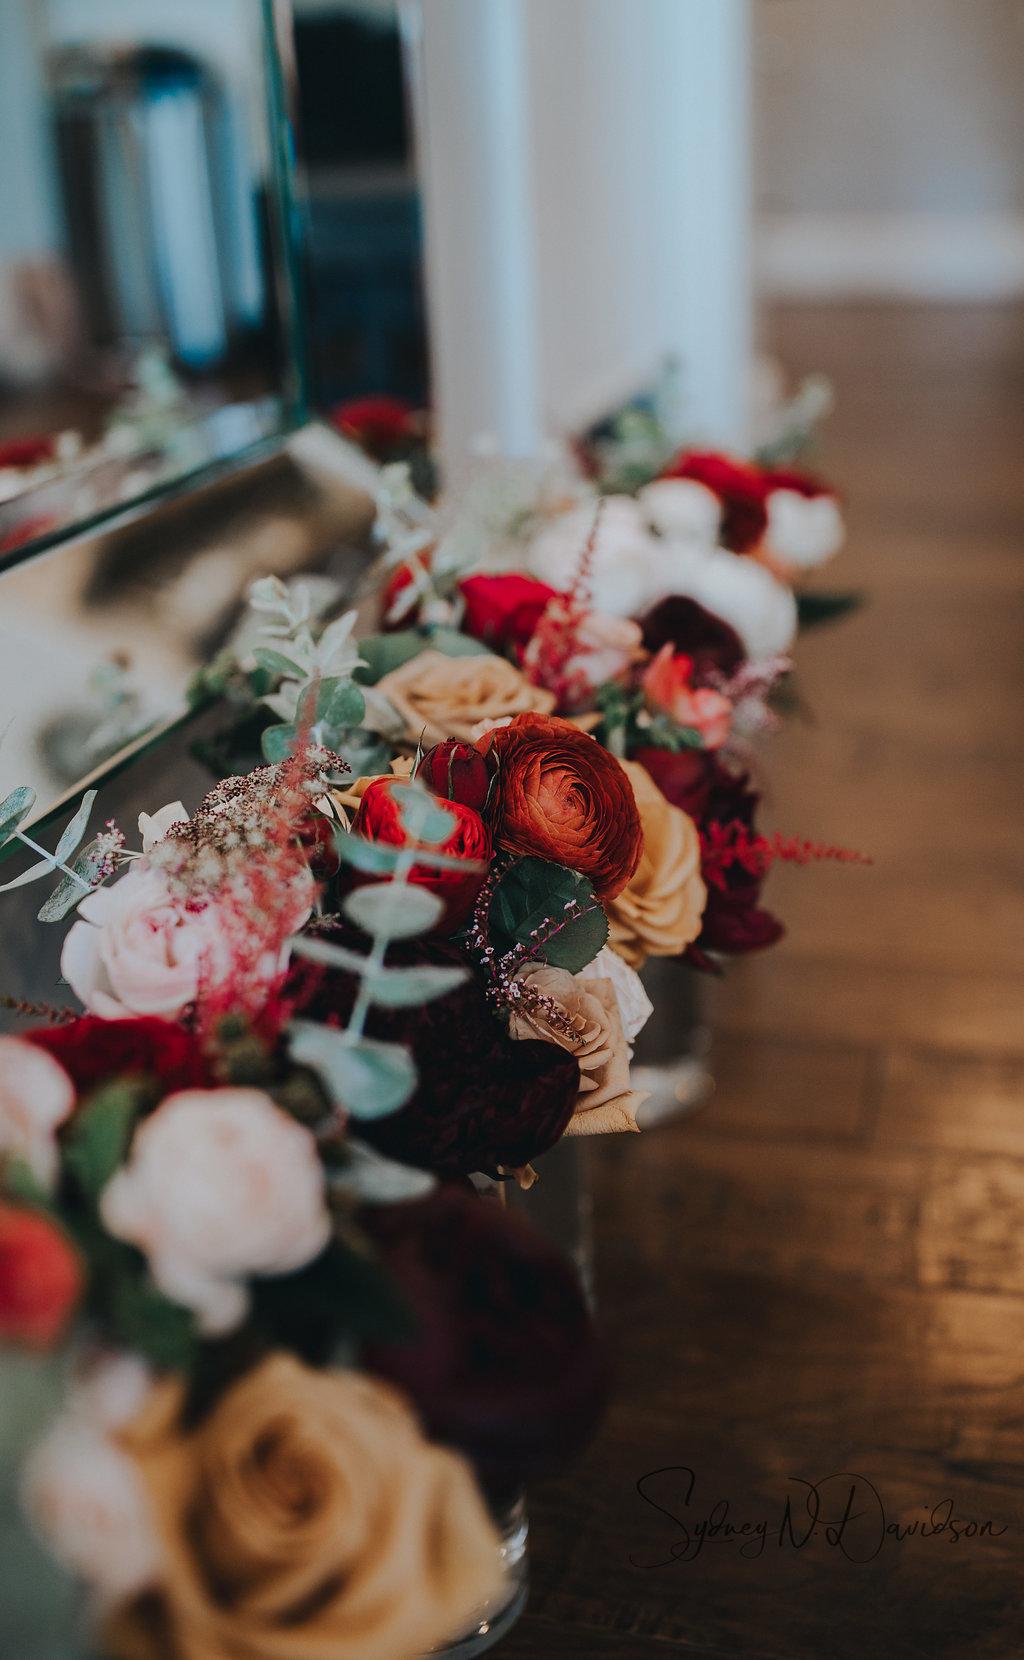 sydney-davidson-wedding-stillwater-oklahoma-wedding-session-traveling-photographer-portrait-tulsa-oklahoma-1415.jpg